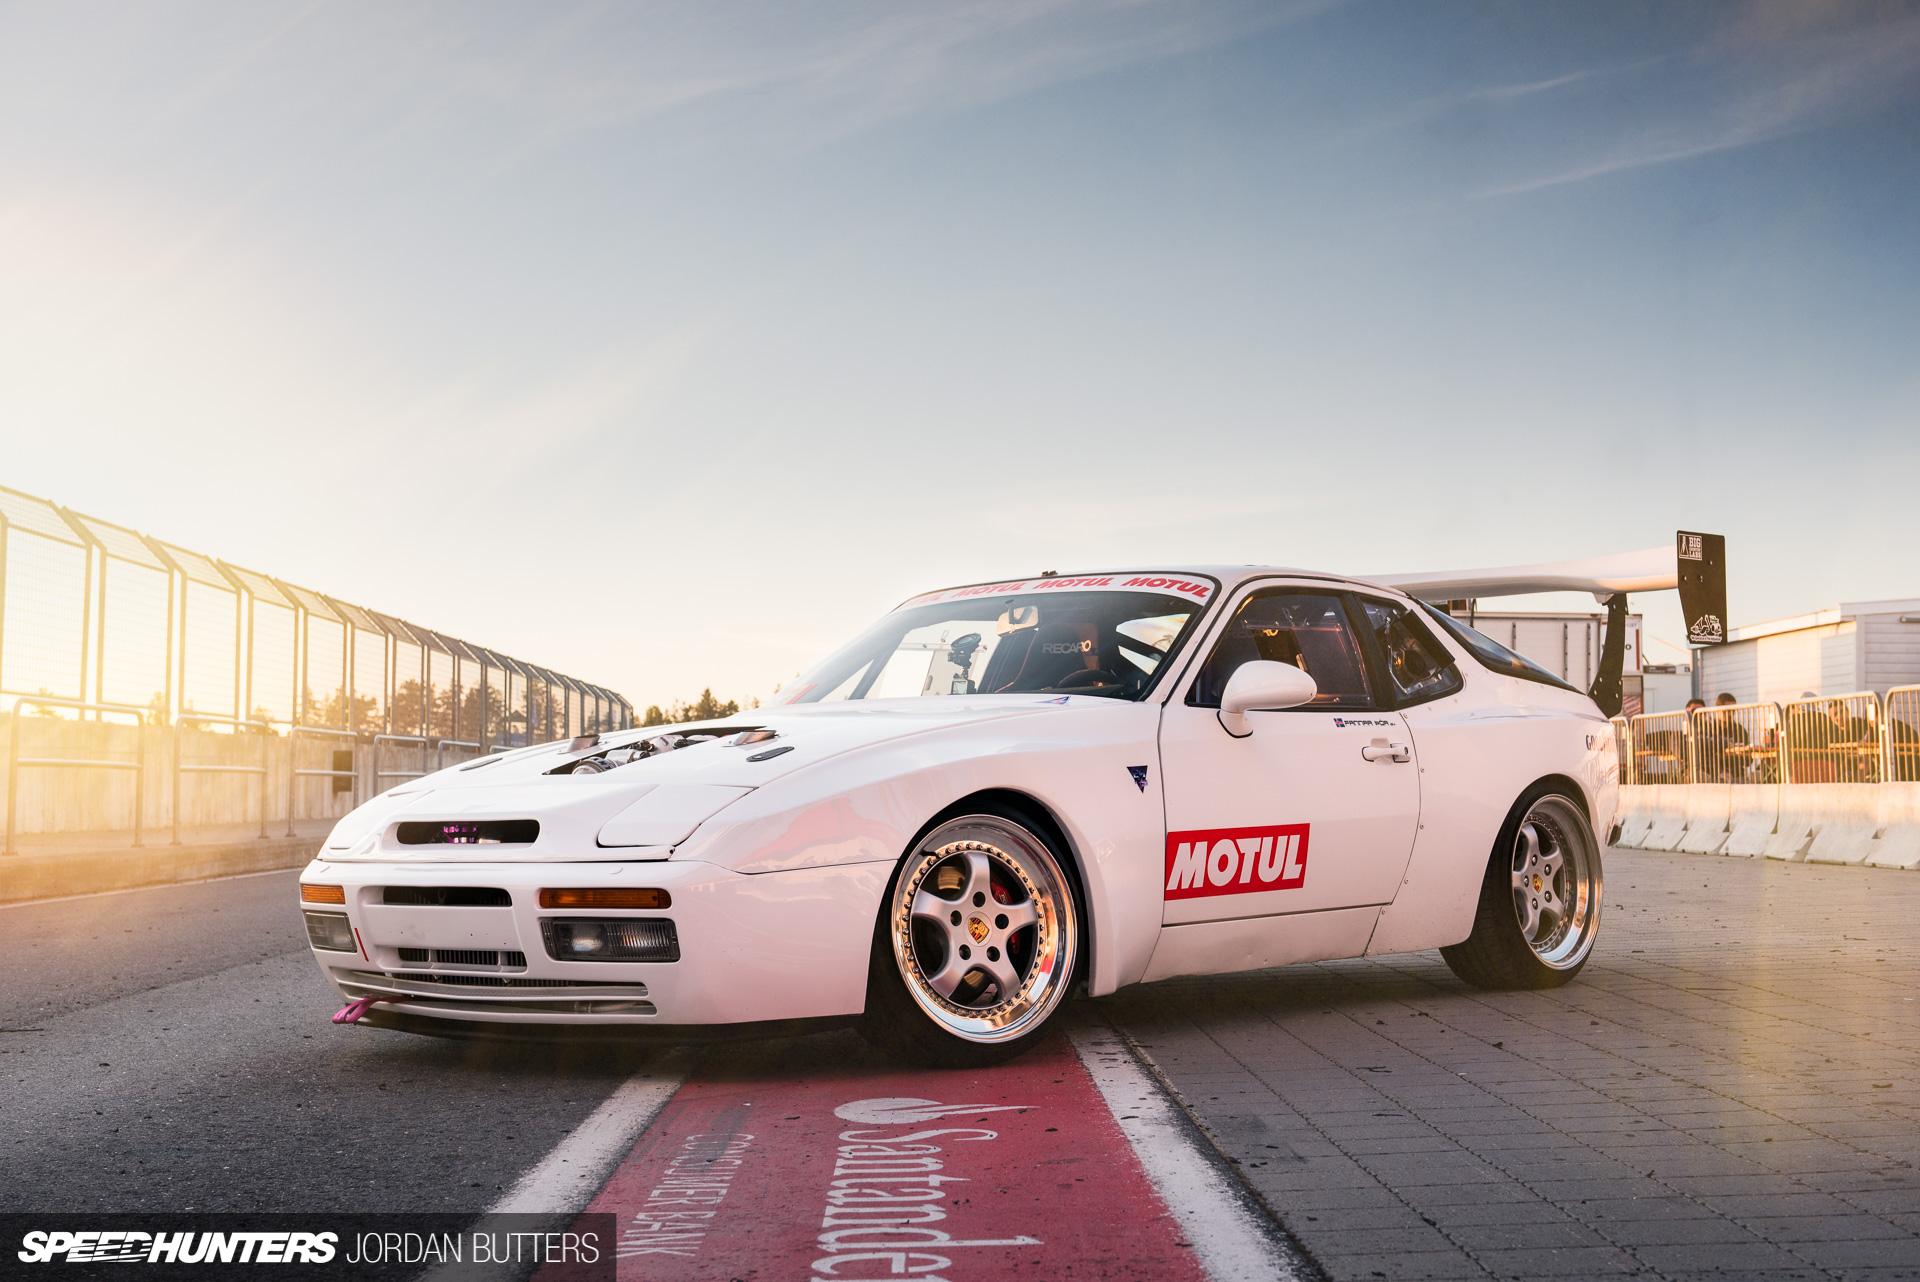 Spoiler Alert A 900hp Turbocharged Ls2 Porsche Speedhunters